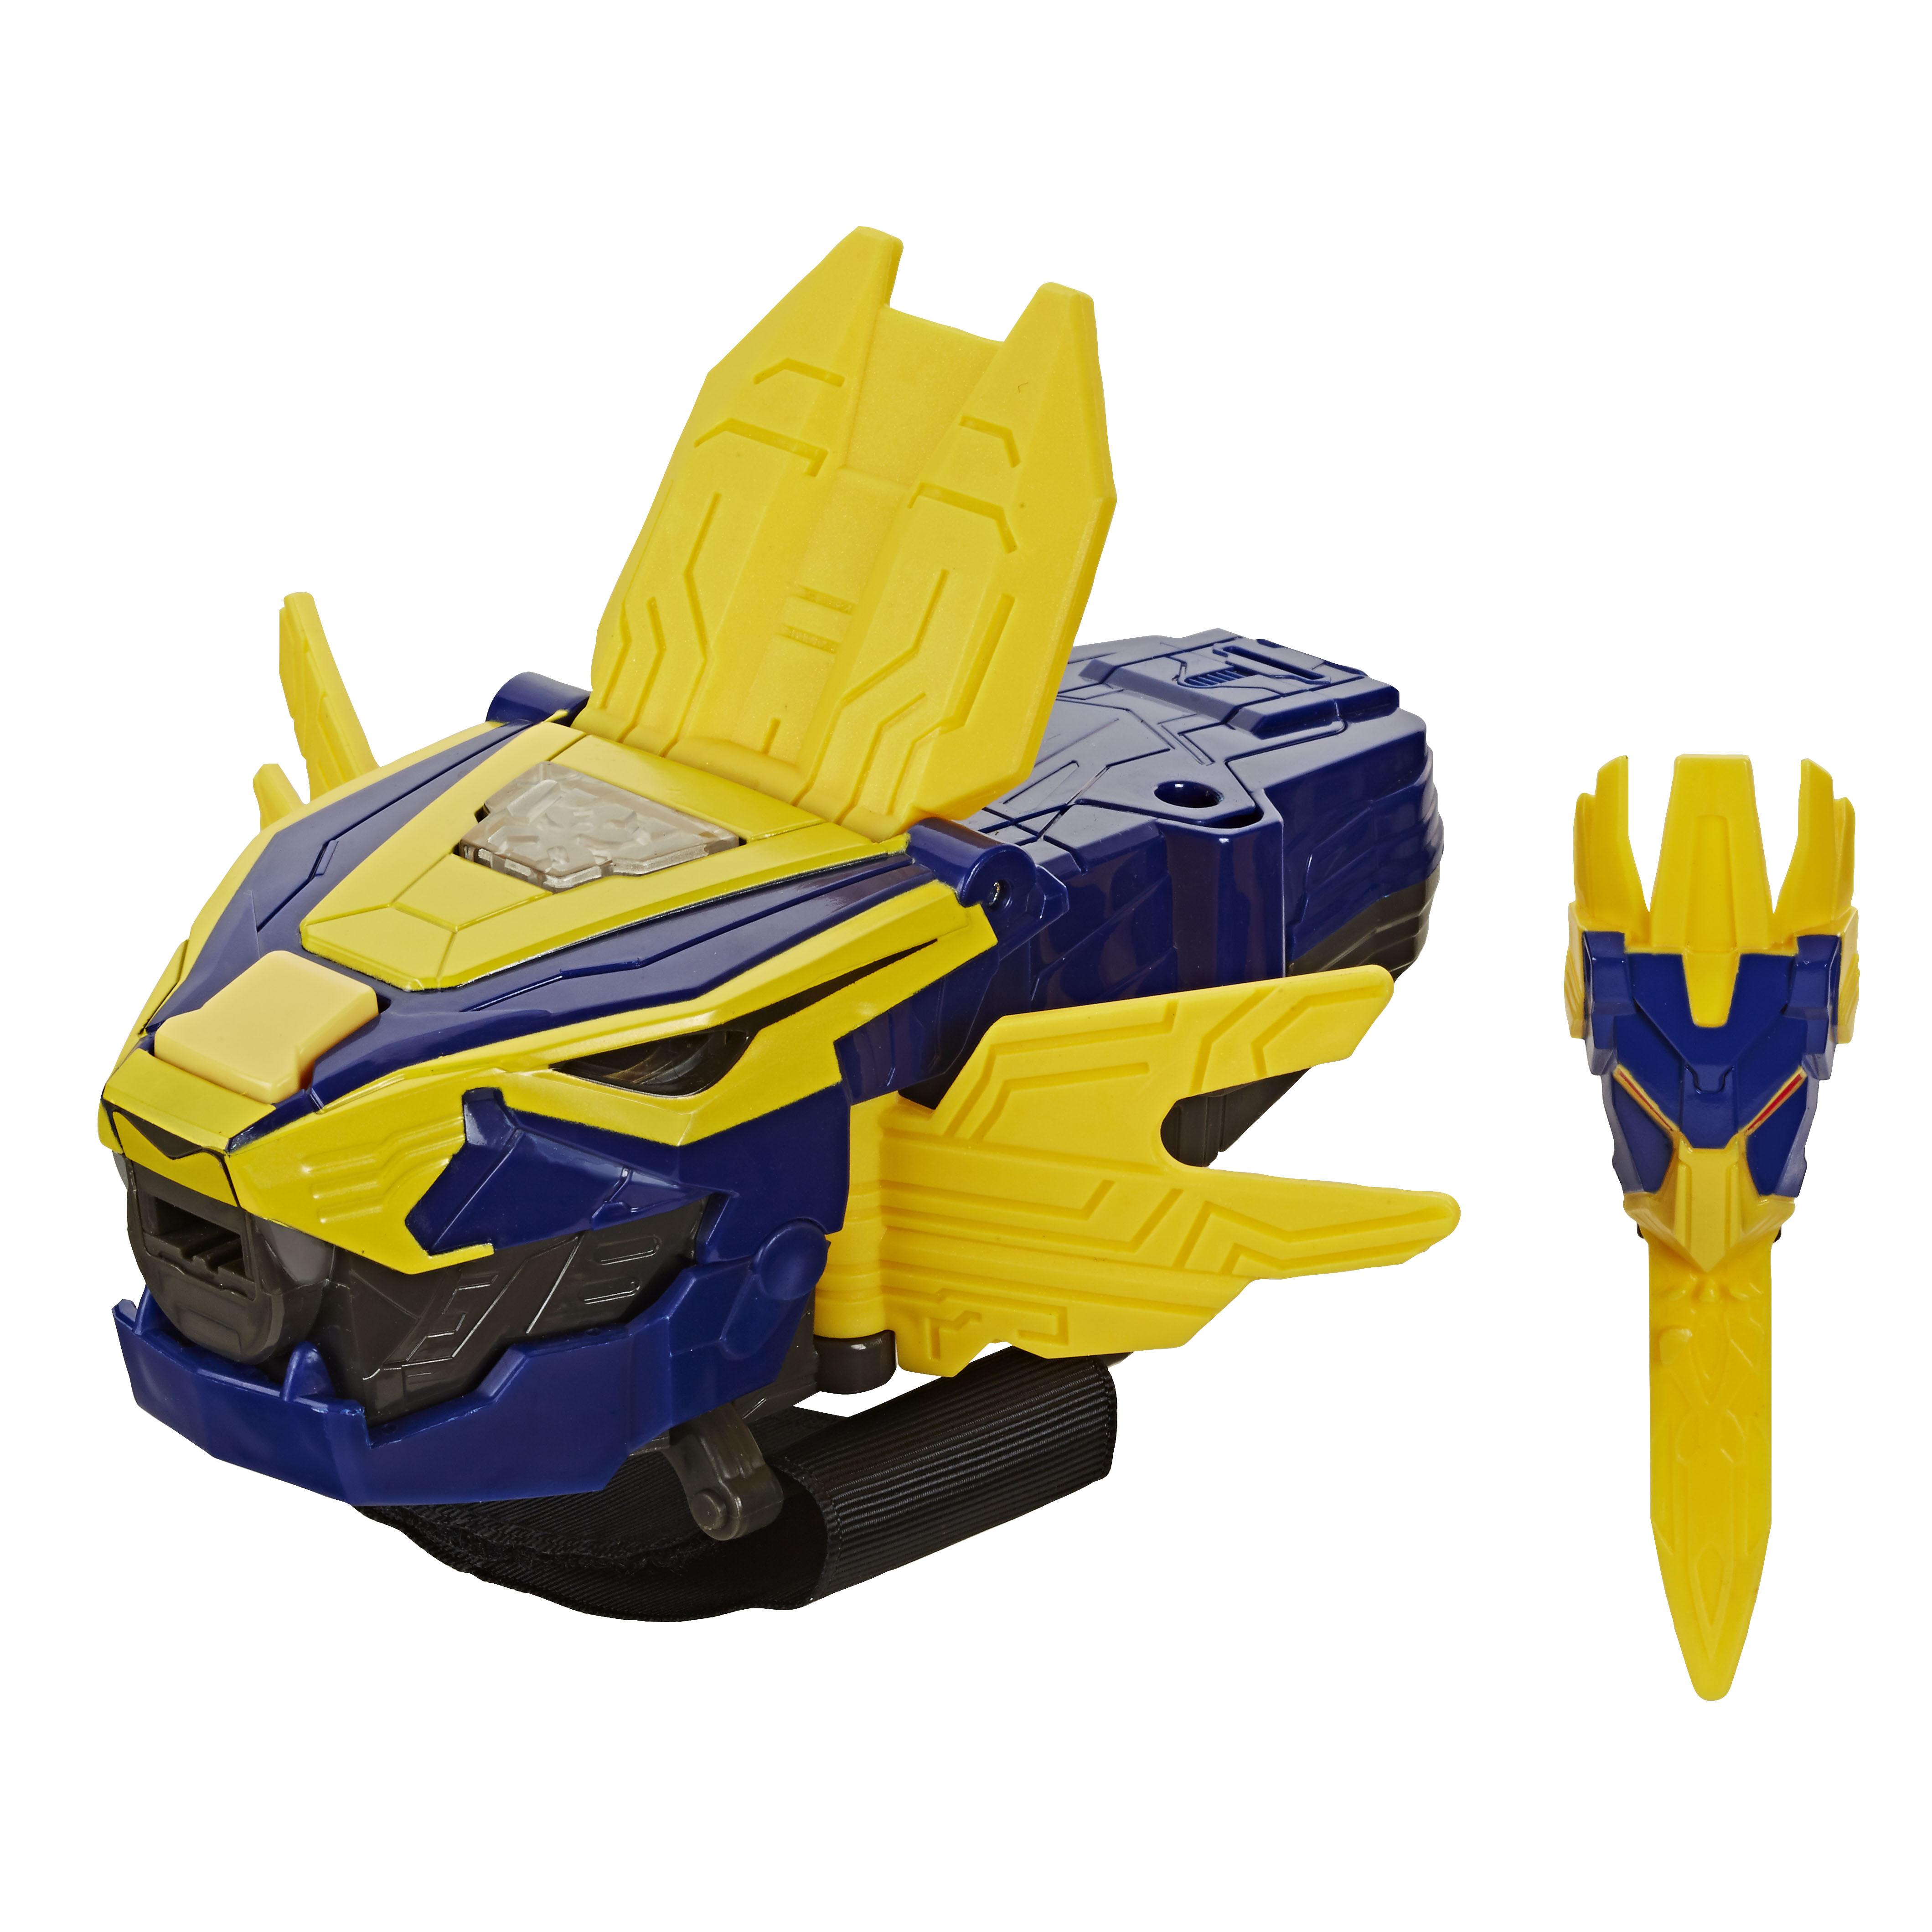 E7538 Beast-X King Morpher_OOP 2